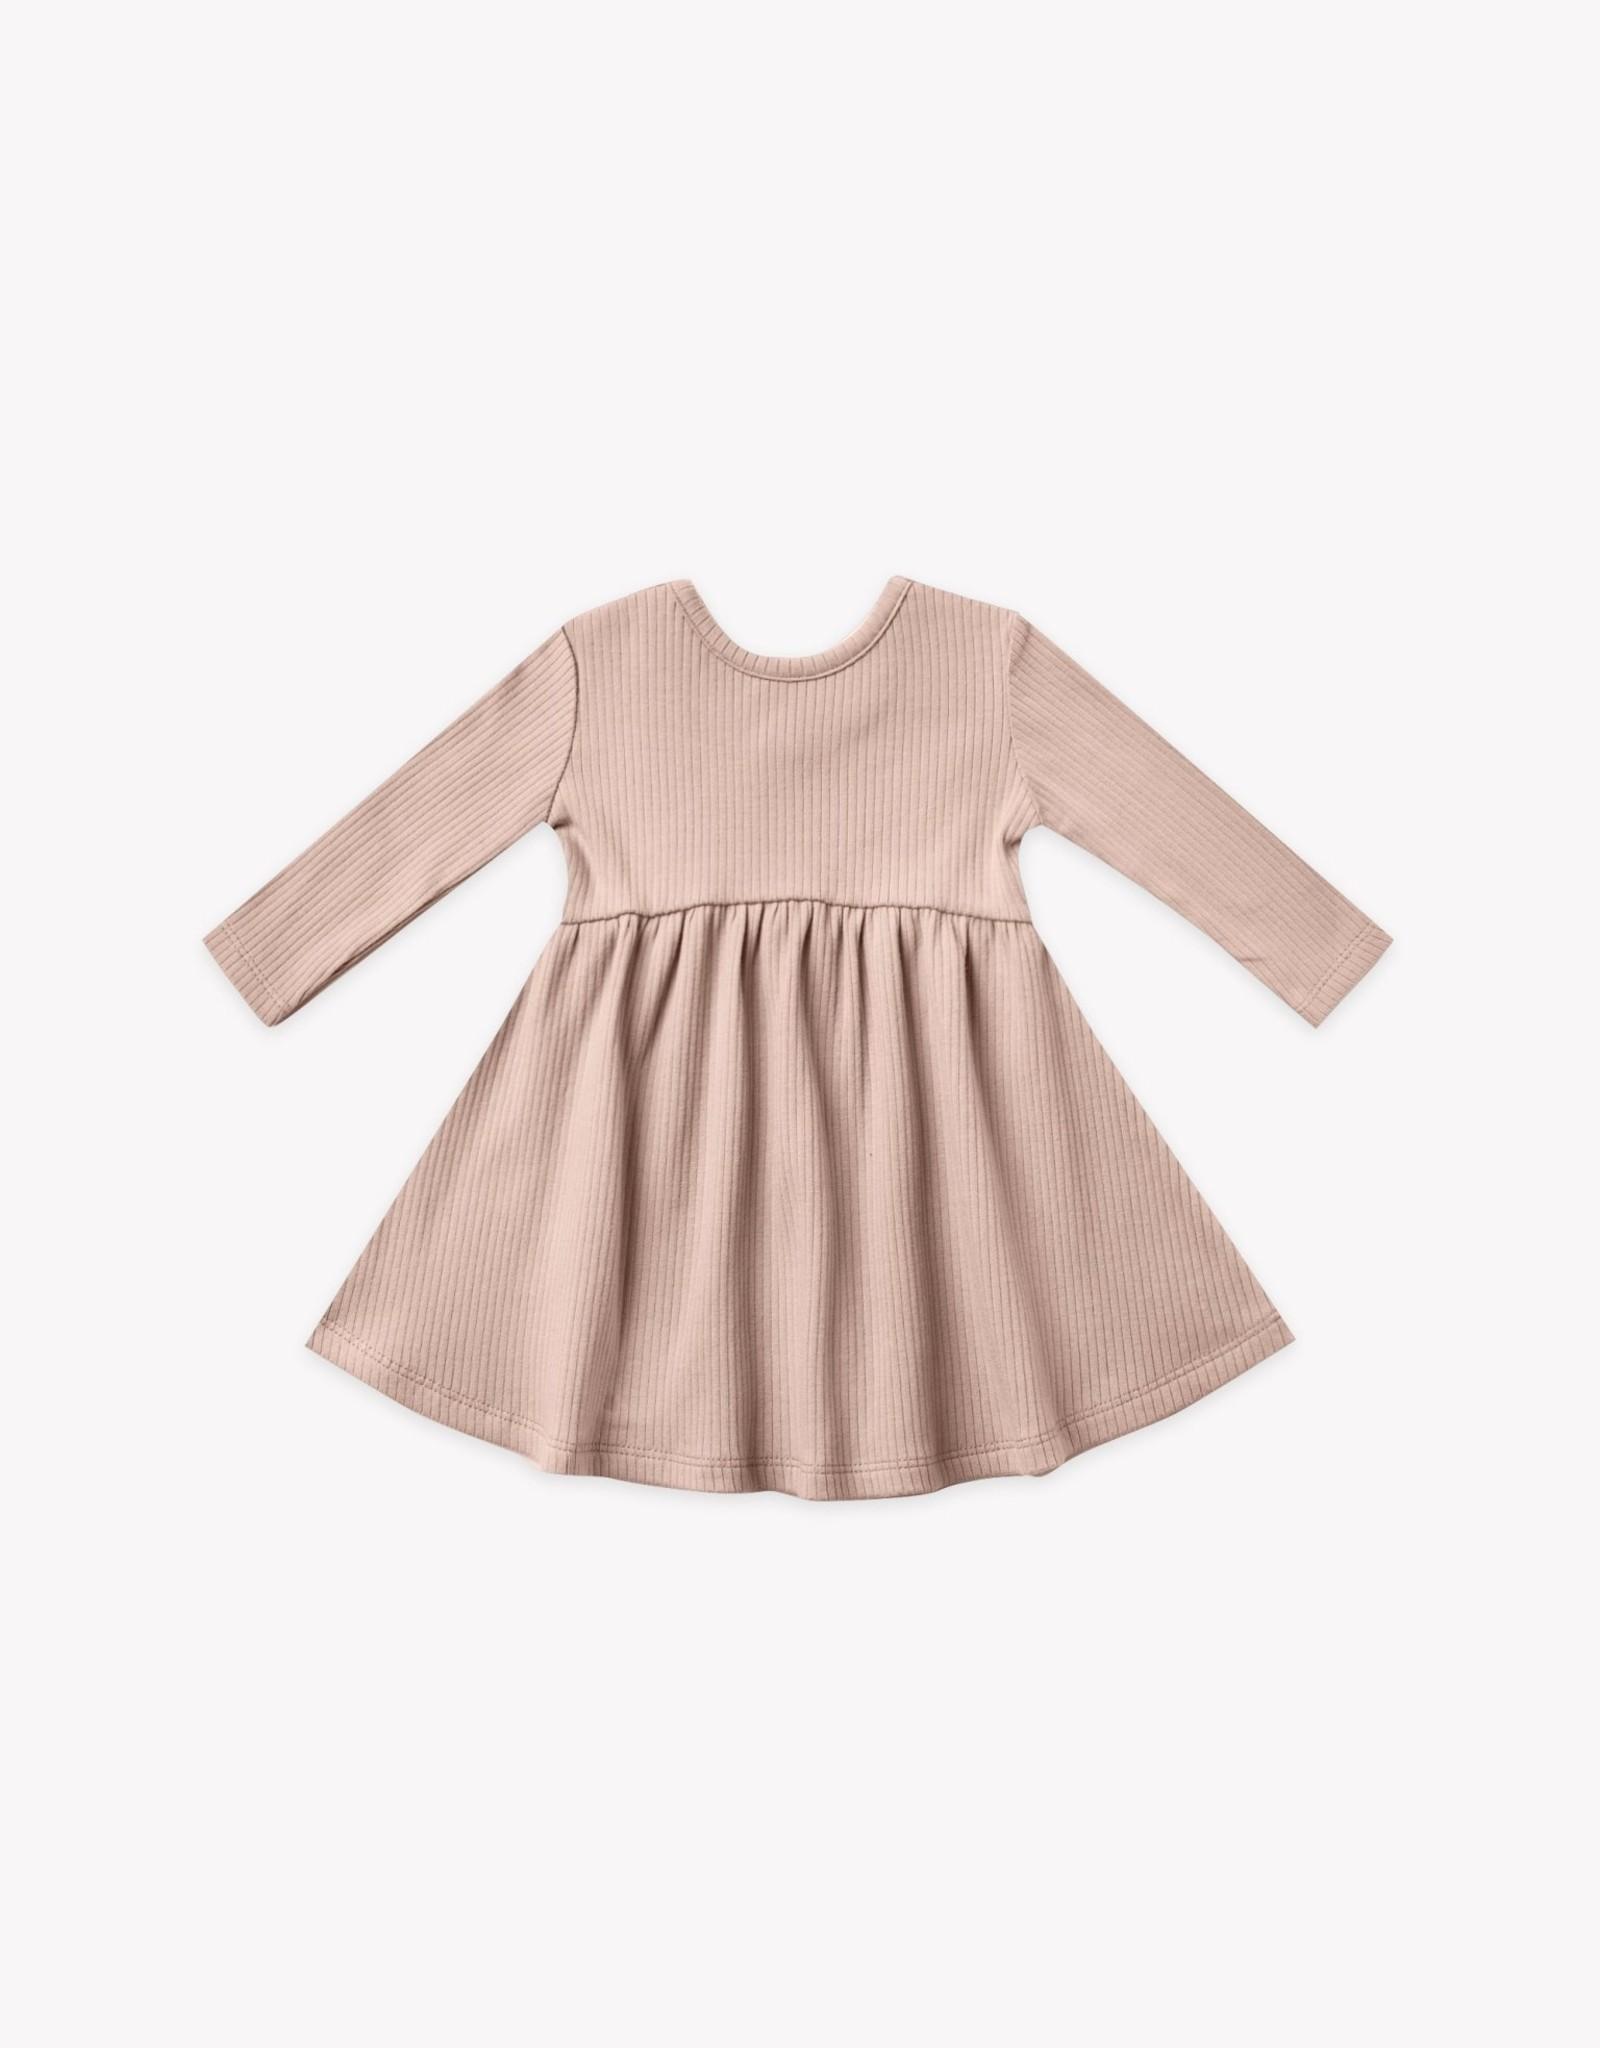 Quincy Mae Quincy Mae Ribbed Longsleeve Dress